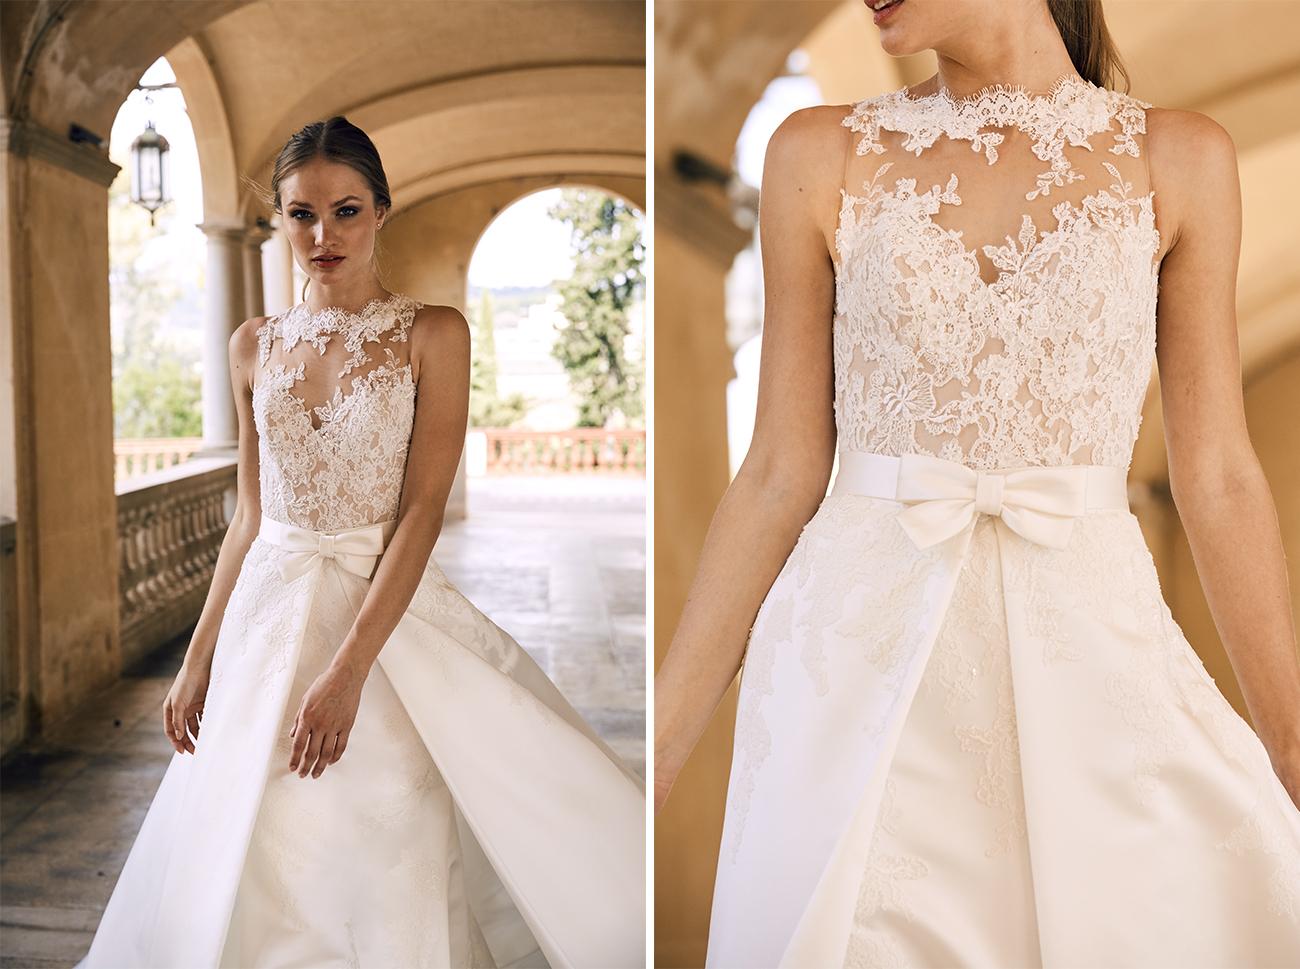 St Patrick Wedding Dresses Prices 82 Trend Meet the Palma dress